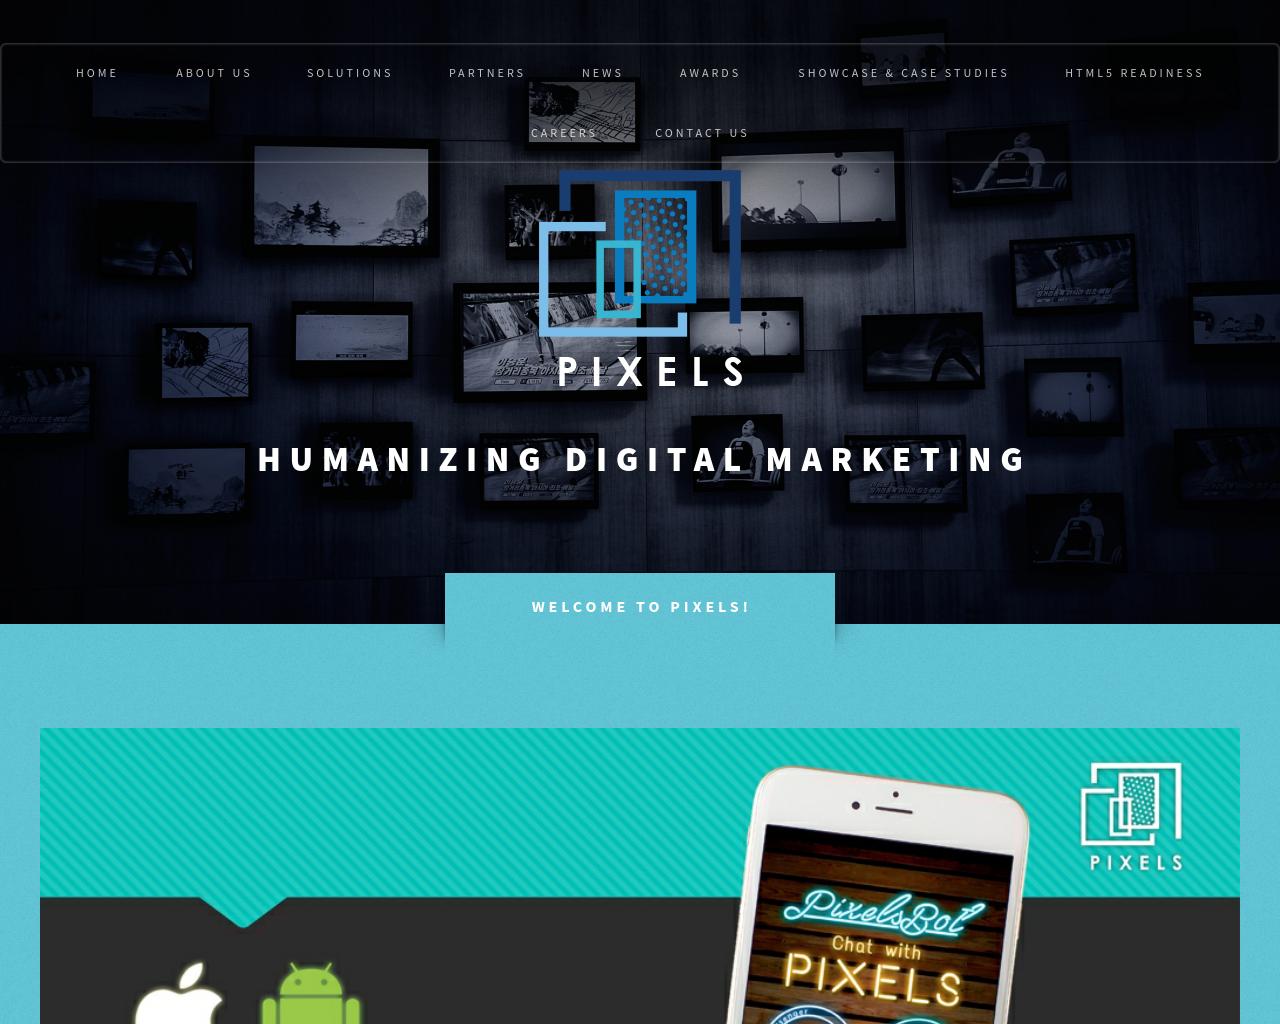 Pixels-Advertising-Reviews-Pricing